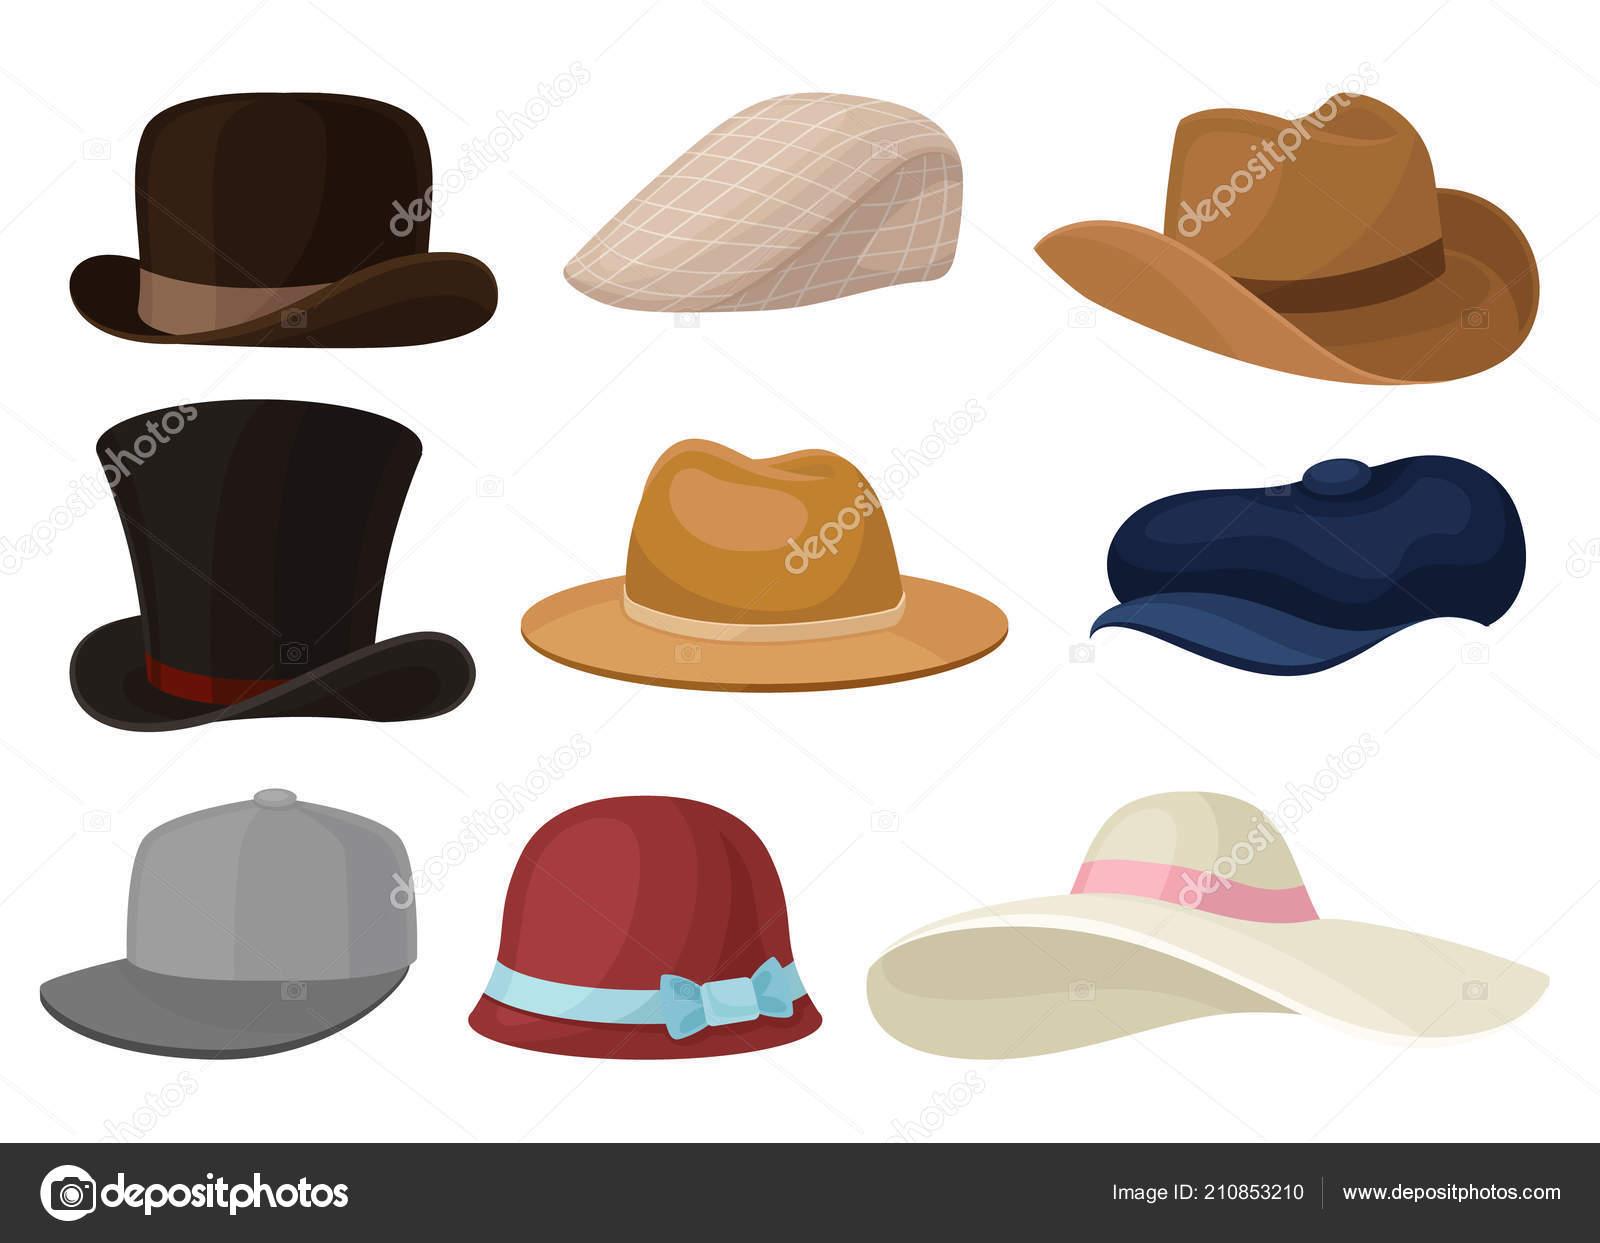 be1f01ee37c Επίπεδη διάνυσμα σύνολο άνδρας και γυναίκα καπέλα. Μοντέρνα ανδρικά ...